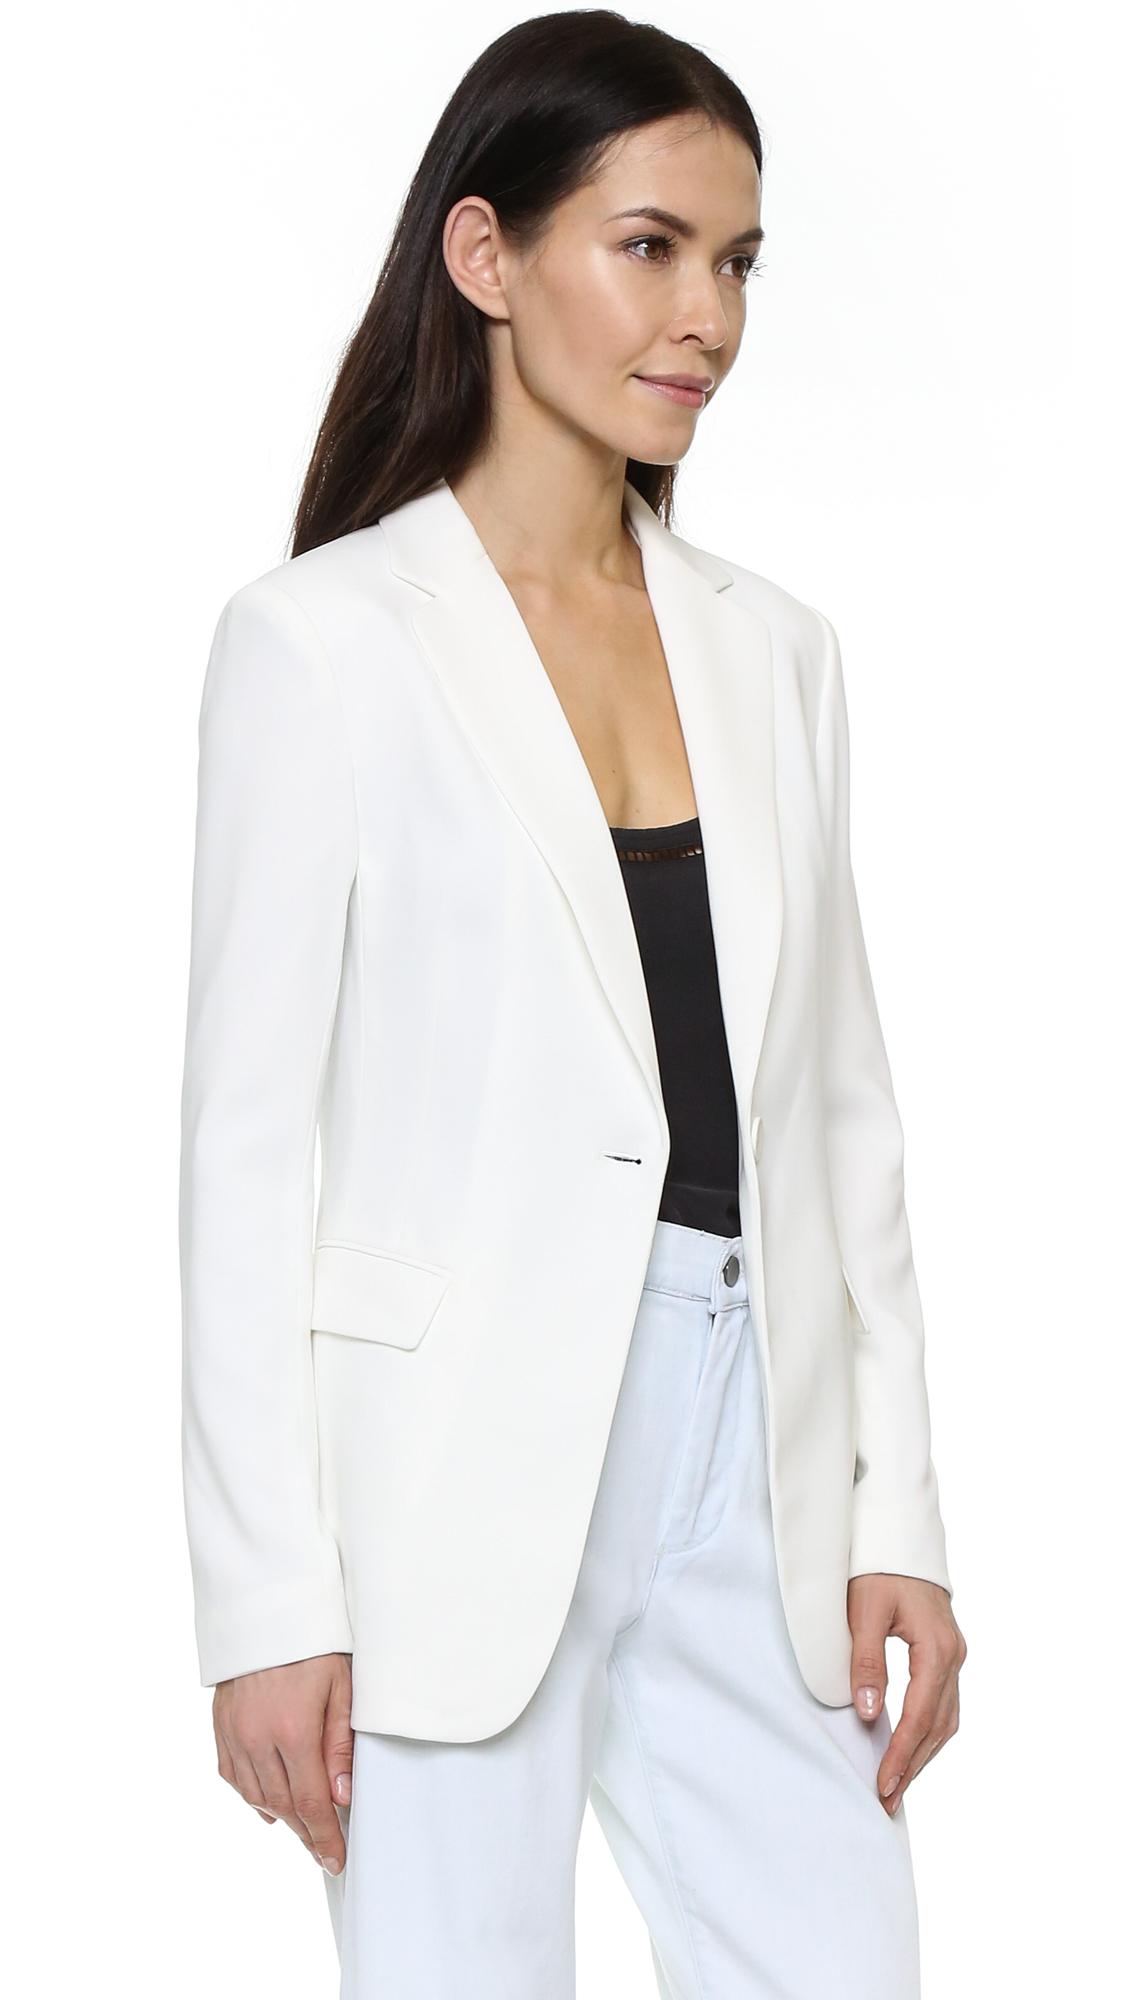 James jeans Single Button Classic Blazer in White